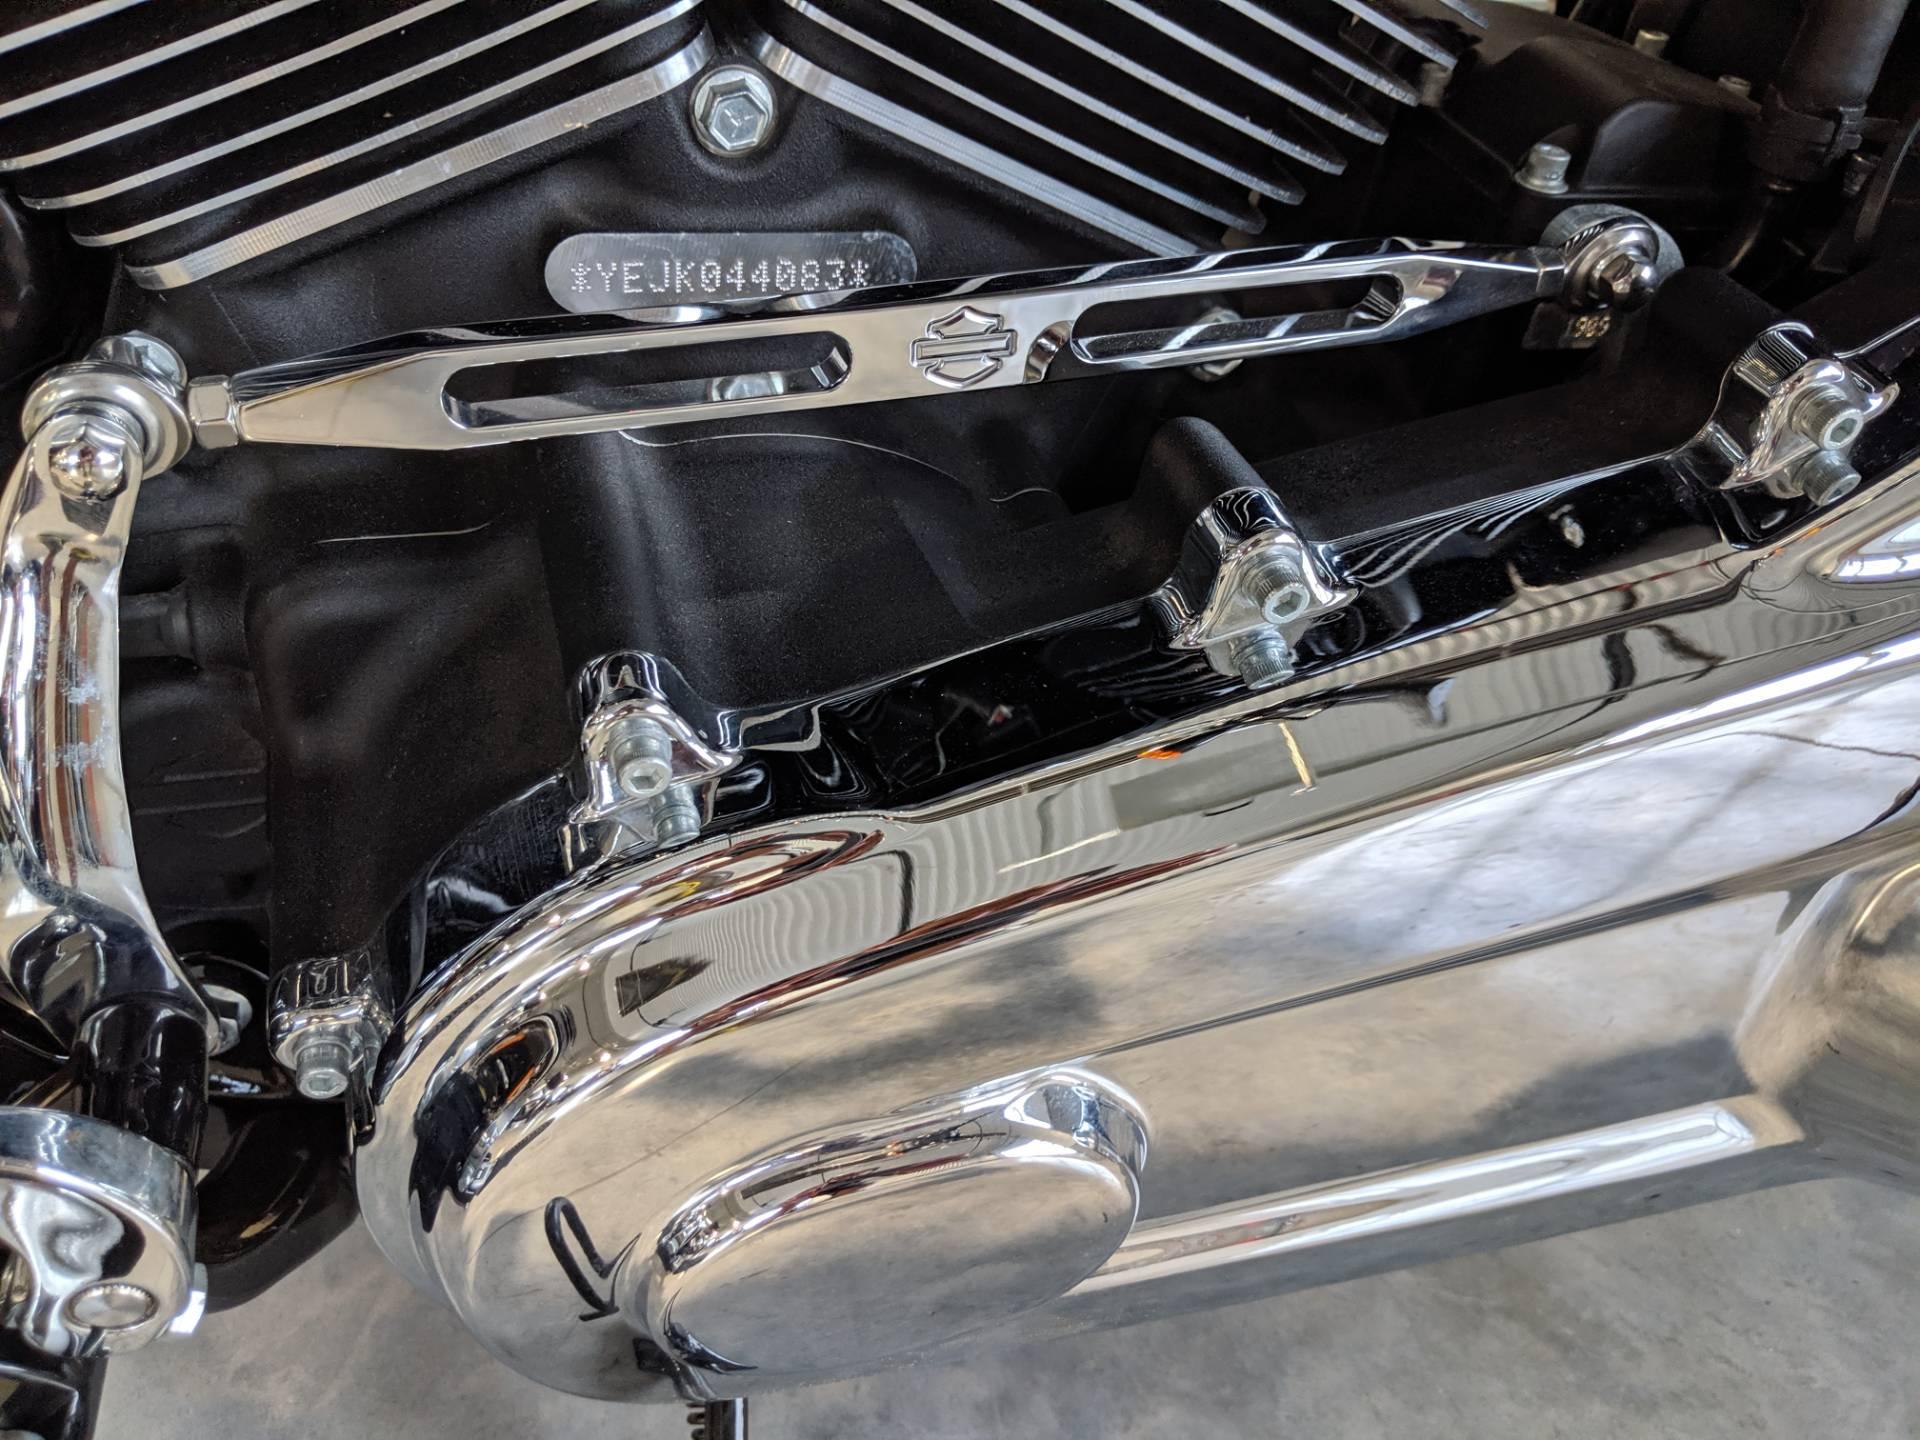 2019 Harley-Davidson Breakout® 107 in Rapid City, South Dakota